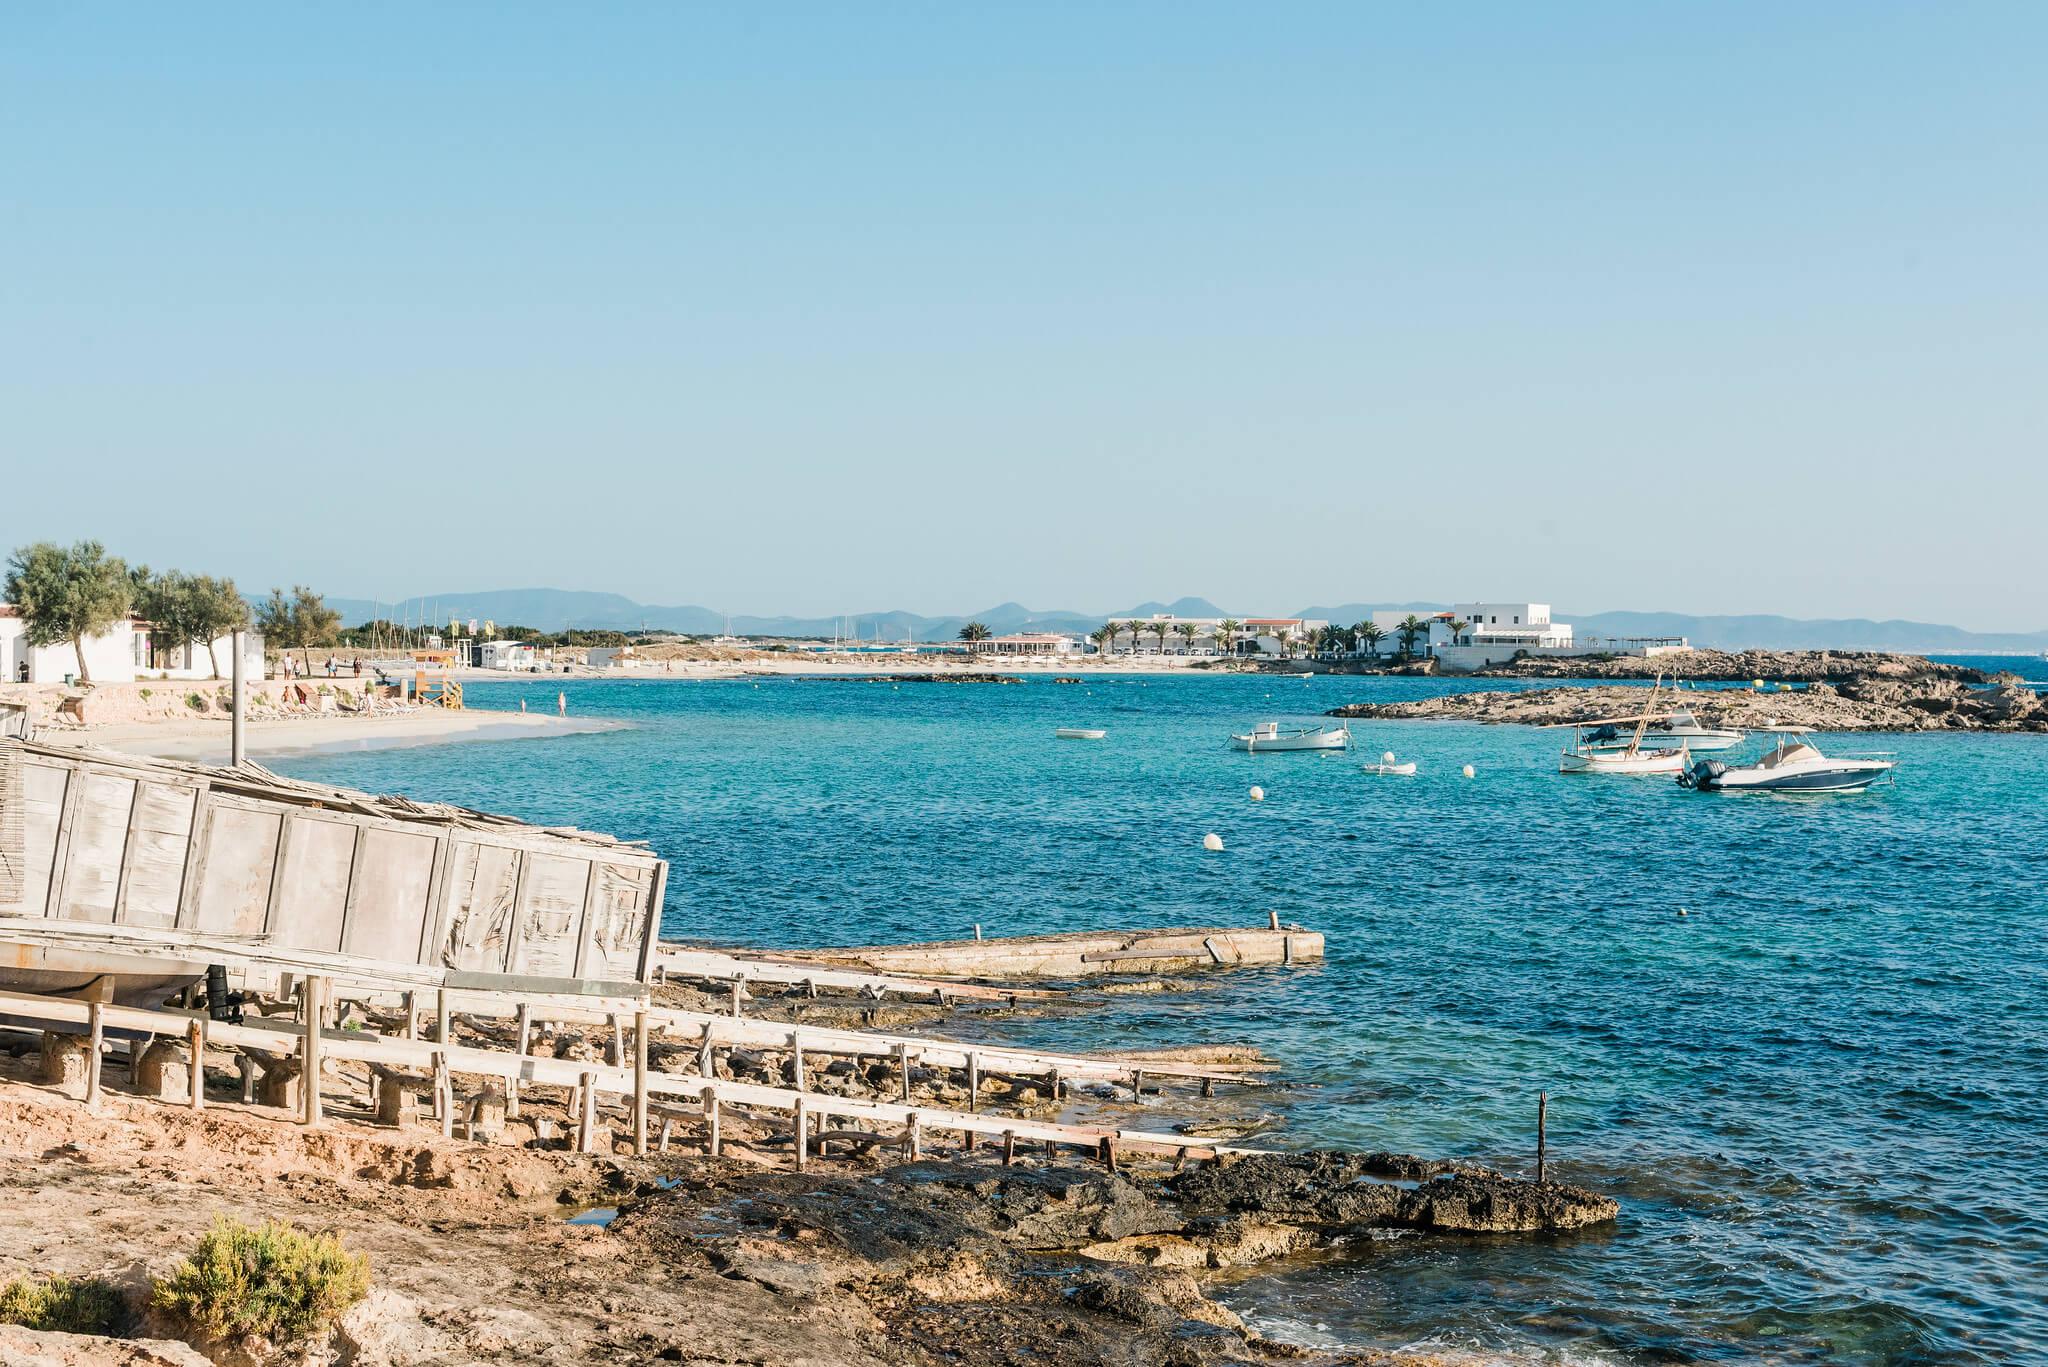 https://www.white-ibiza.com/wp-content/uploads/2020/03/formentera-beaches-es-pujols-2020-08.jpg